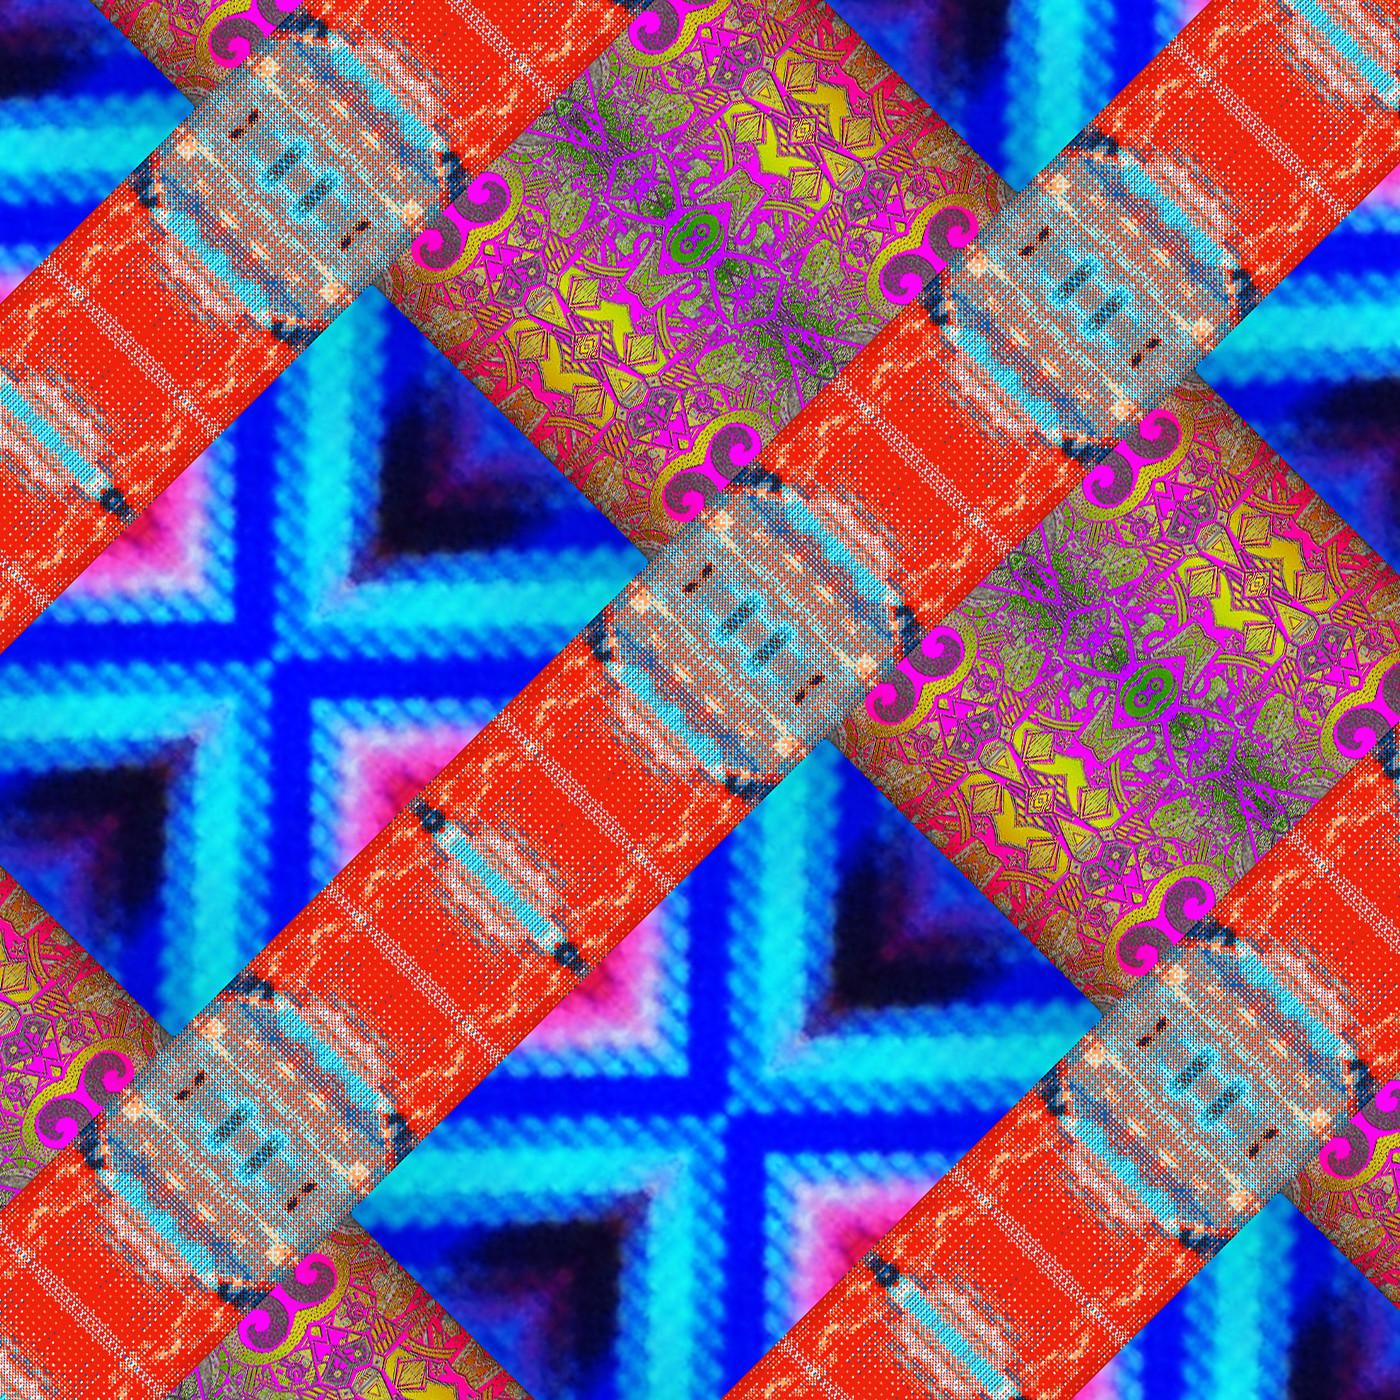 Dismantled Batteries: vivid, digital, acidic crosshatch pattern